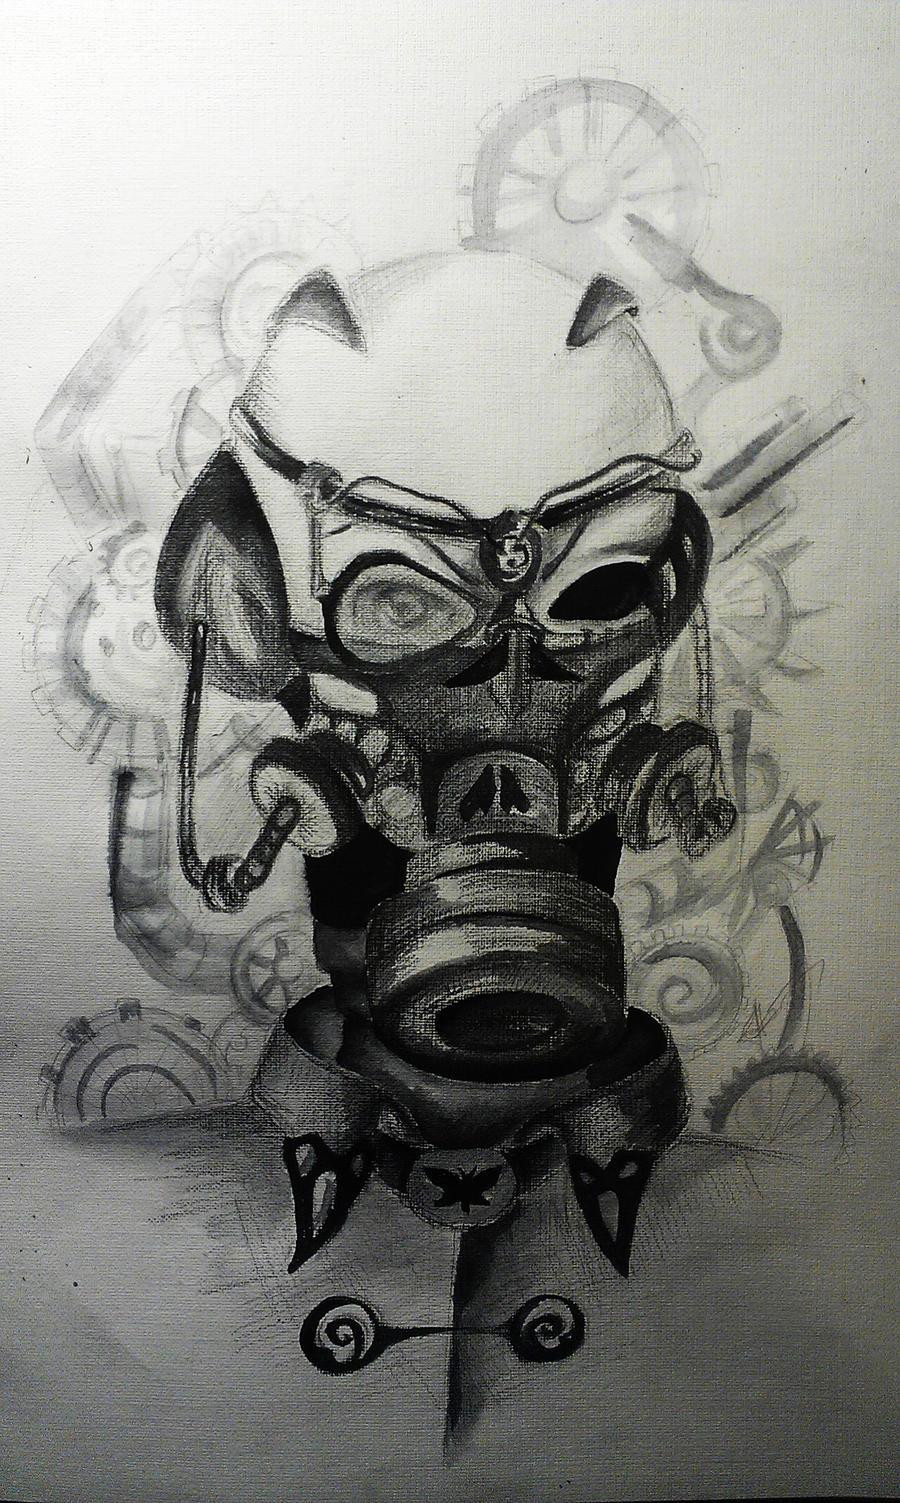 Steampunk gasmask by FairyFaily on DeviantArt